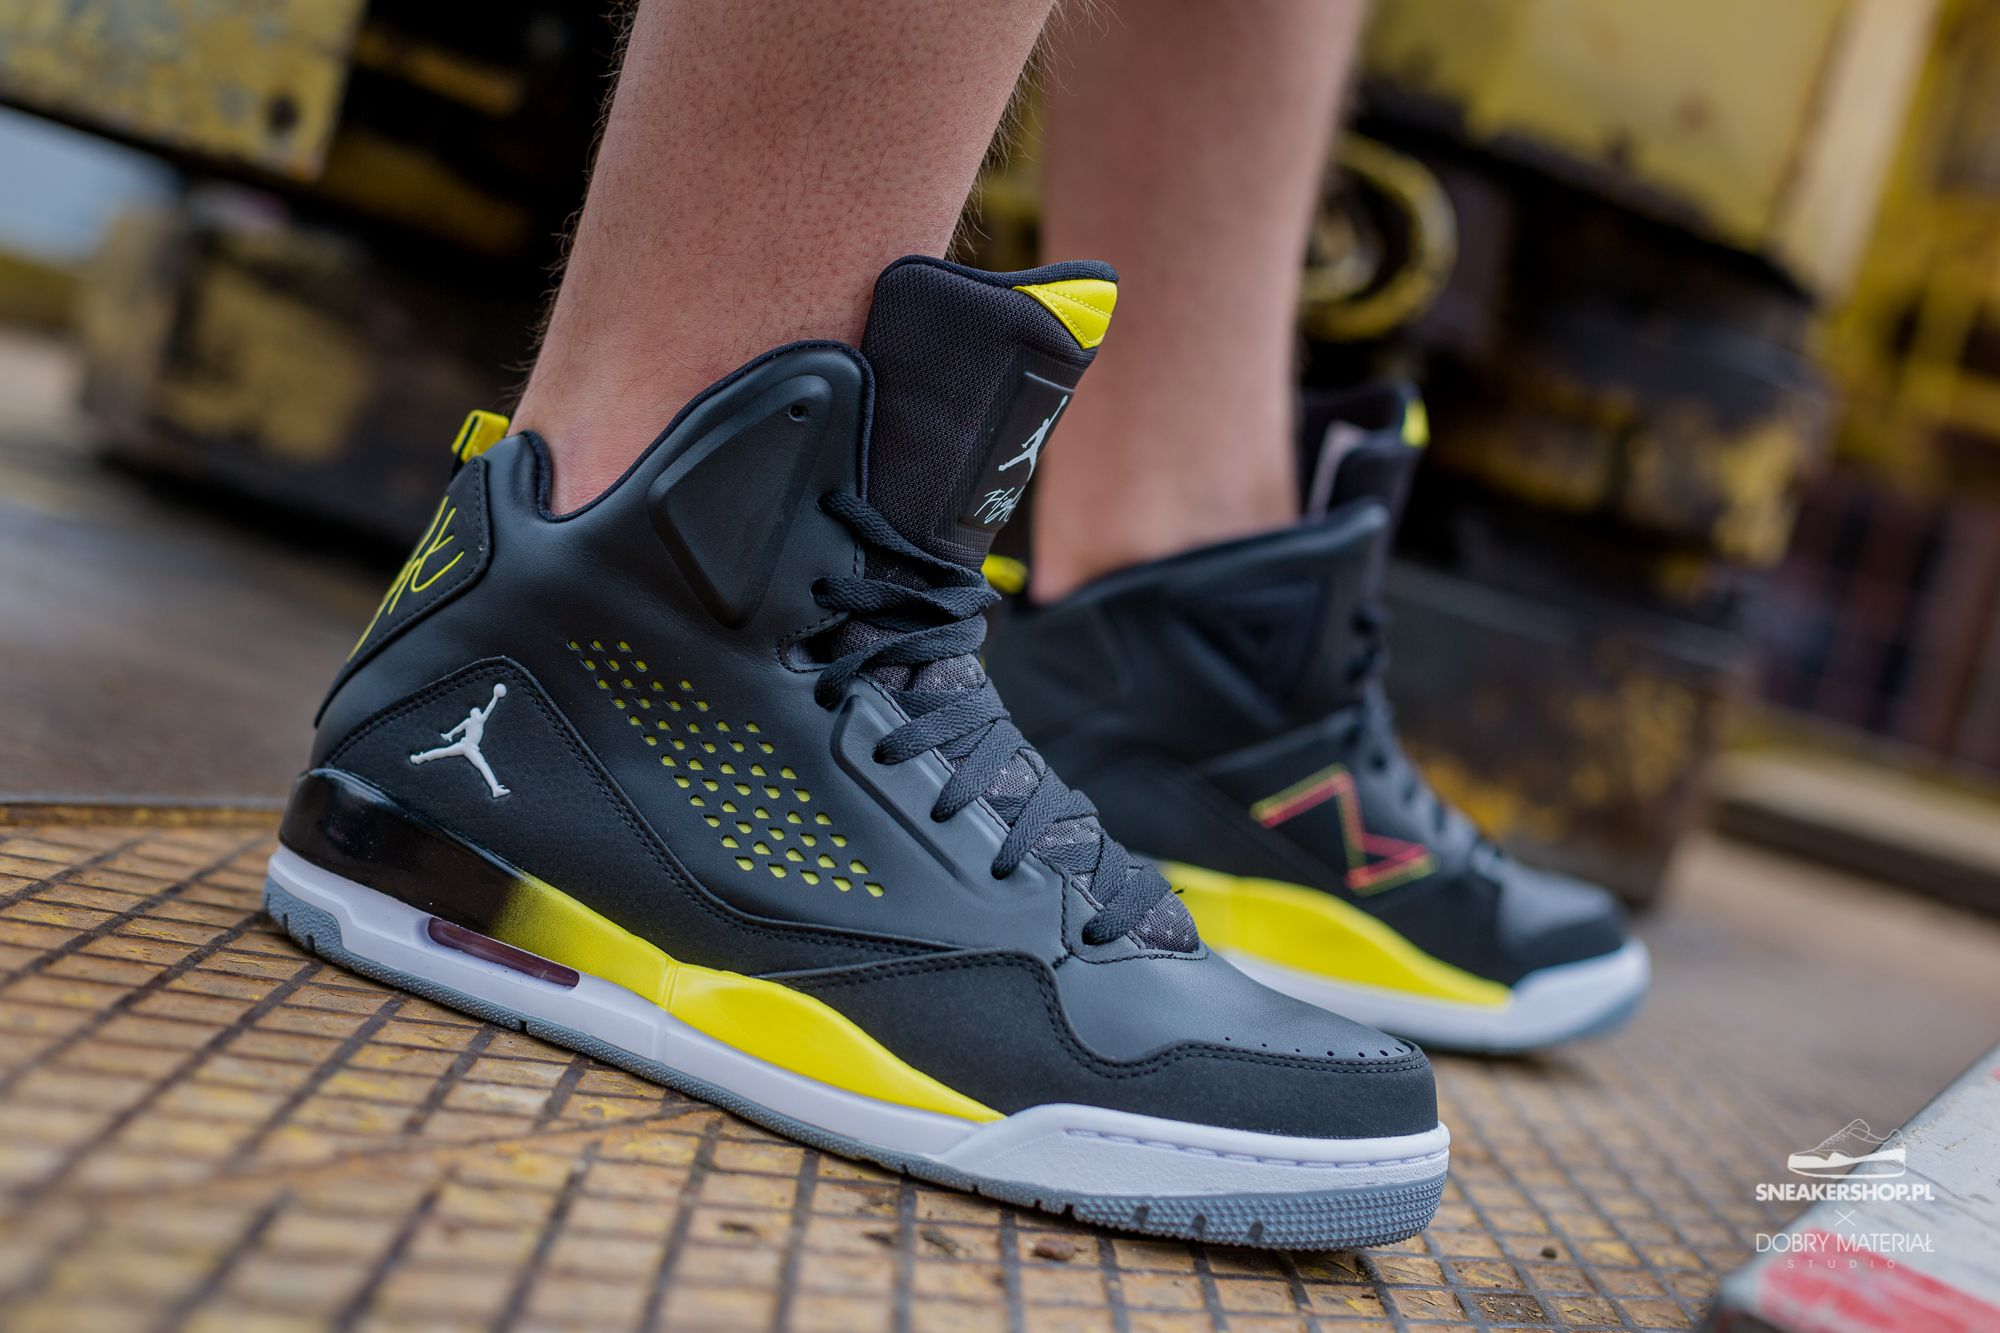 Nike Jordan SC-3 Black/White-Vibrant Yellow-Wolf Grey 629877 070